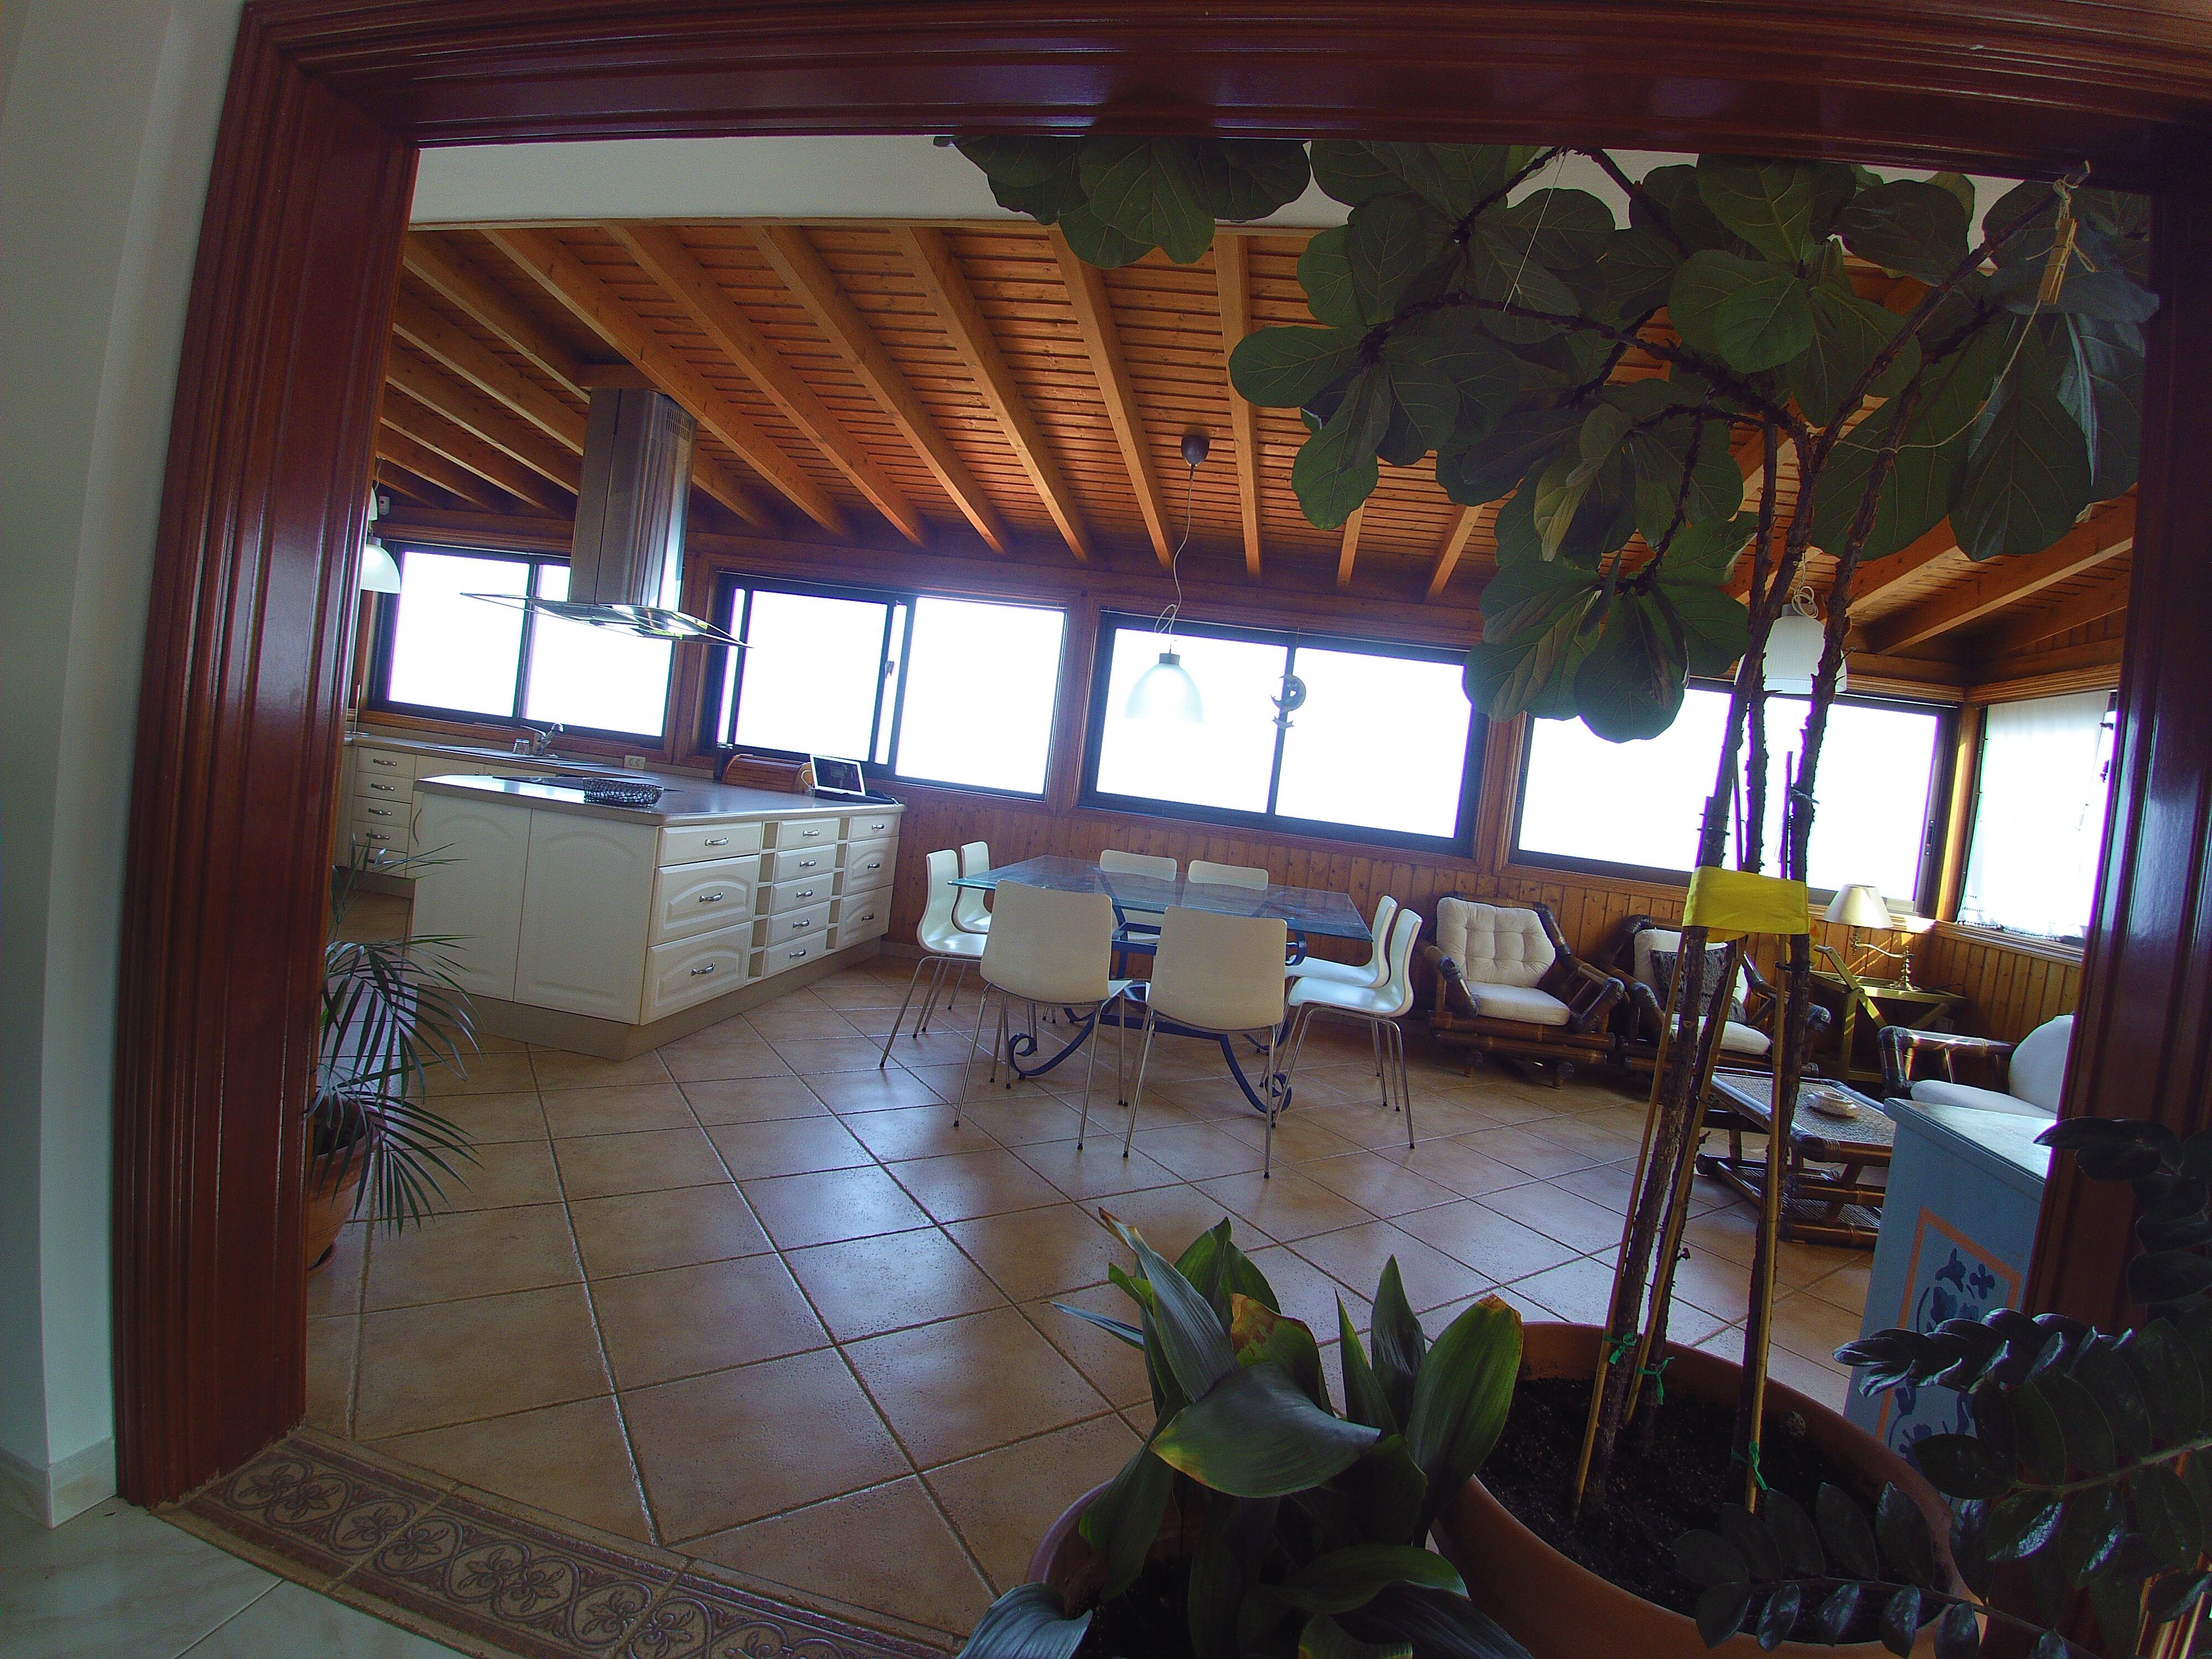 Maison de vacances Villa Primavera beheizbarer Pool kostenloses Wifi Grill (2125225), El Sauzal, Ténérife, Iles Canaries, Espagne, image 8